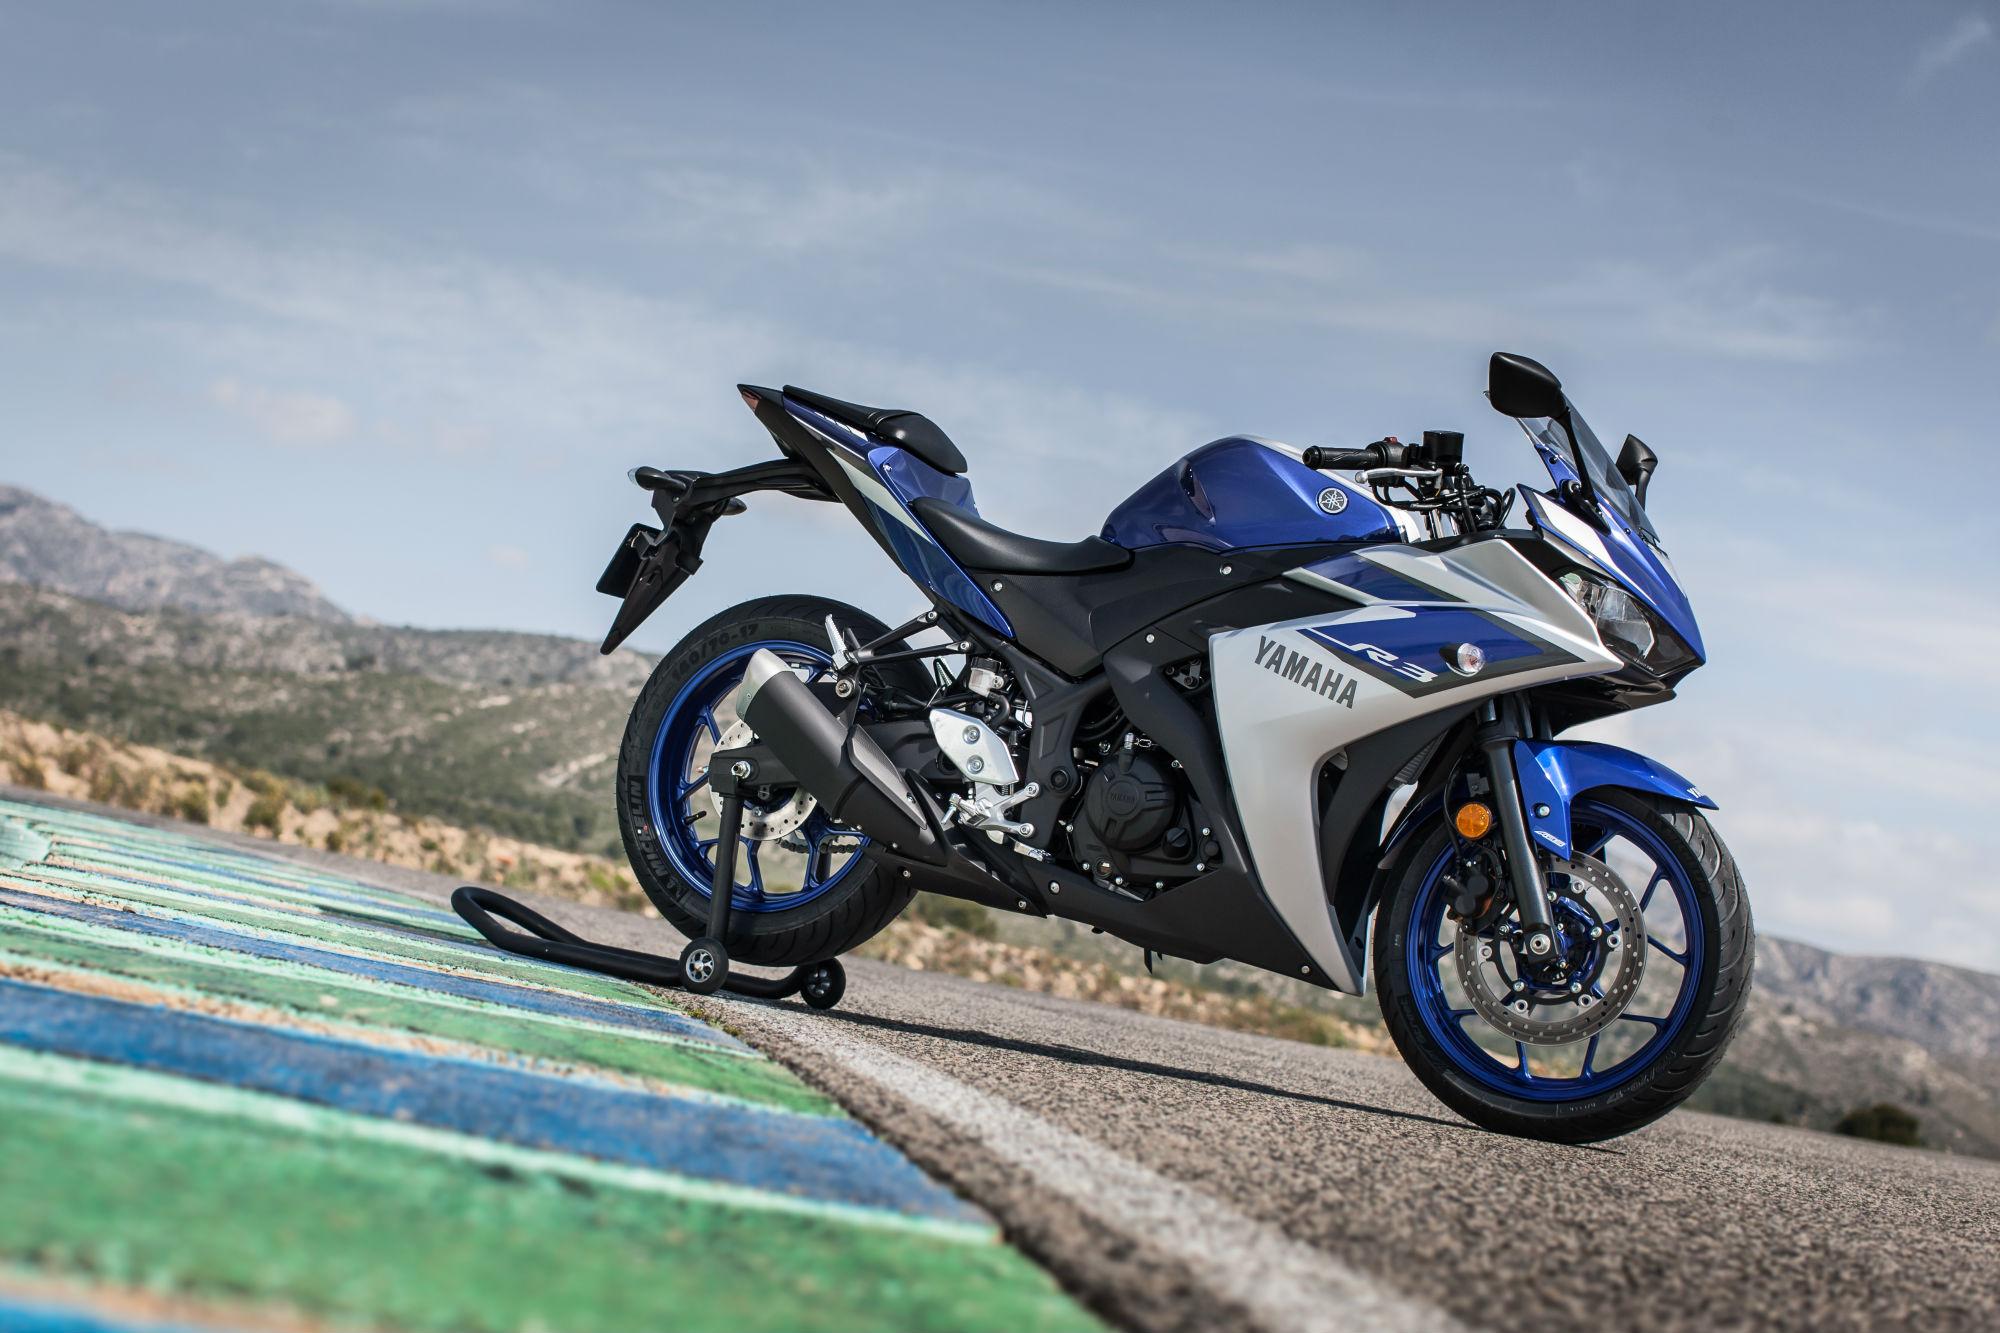 First ride yamaha r3 review visordown for Yamaha r3 price